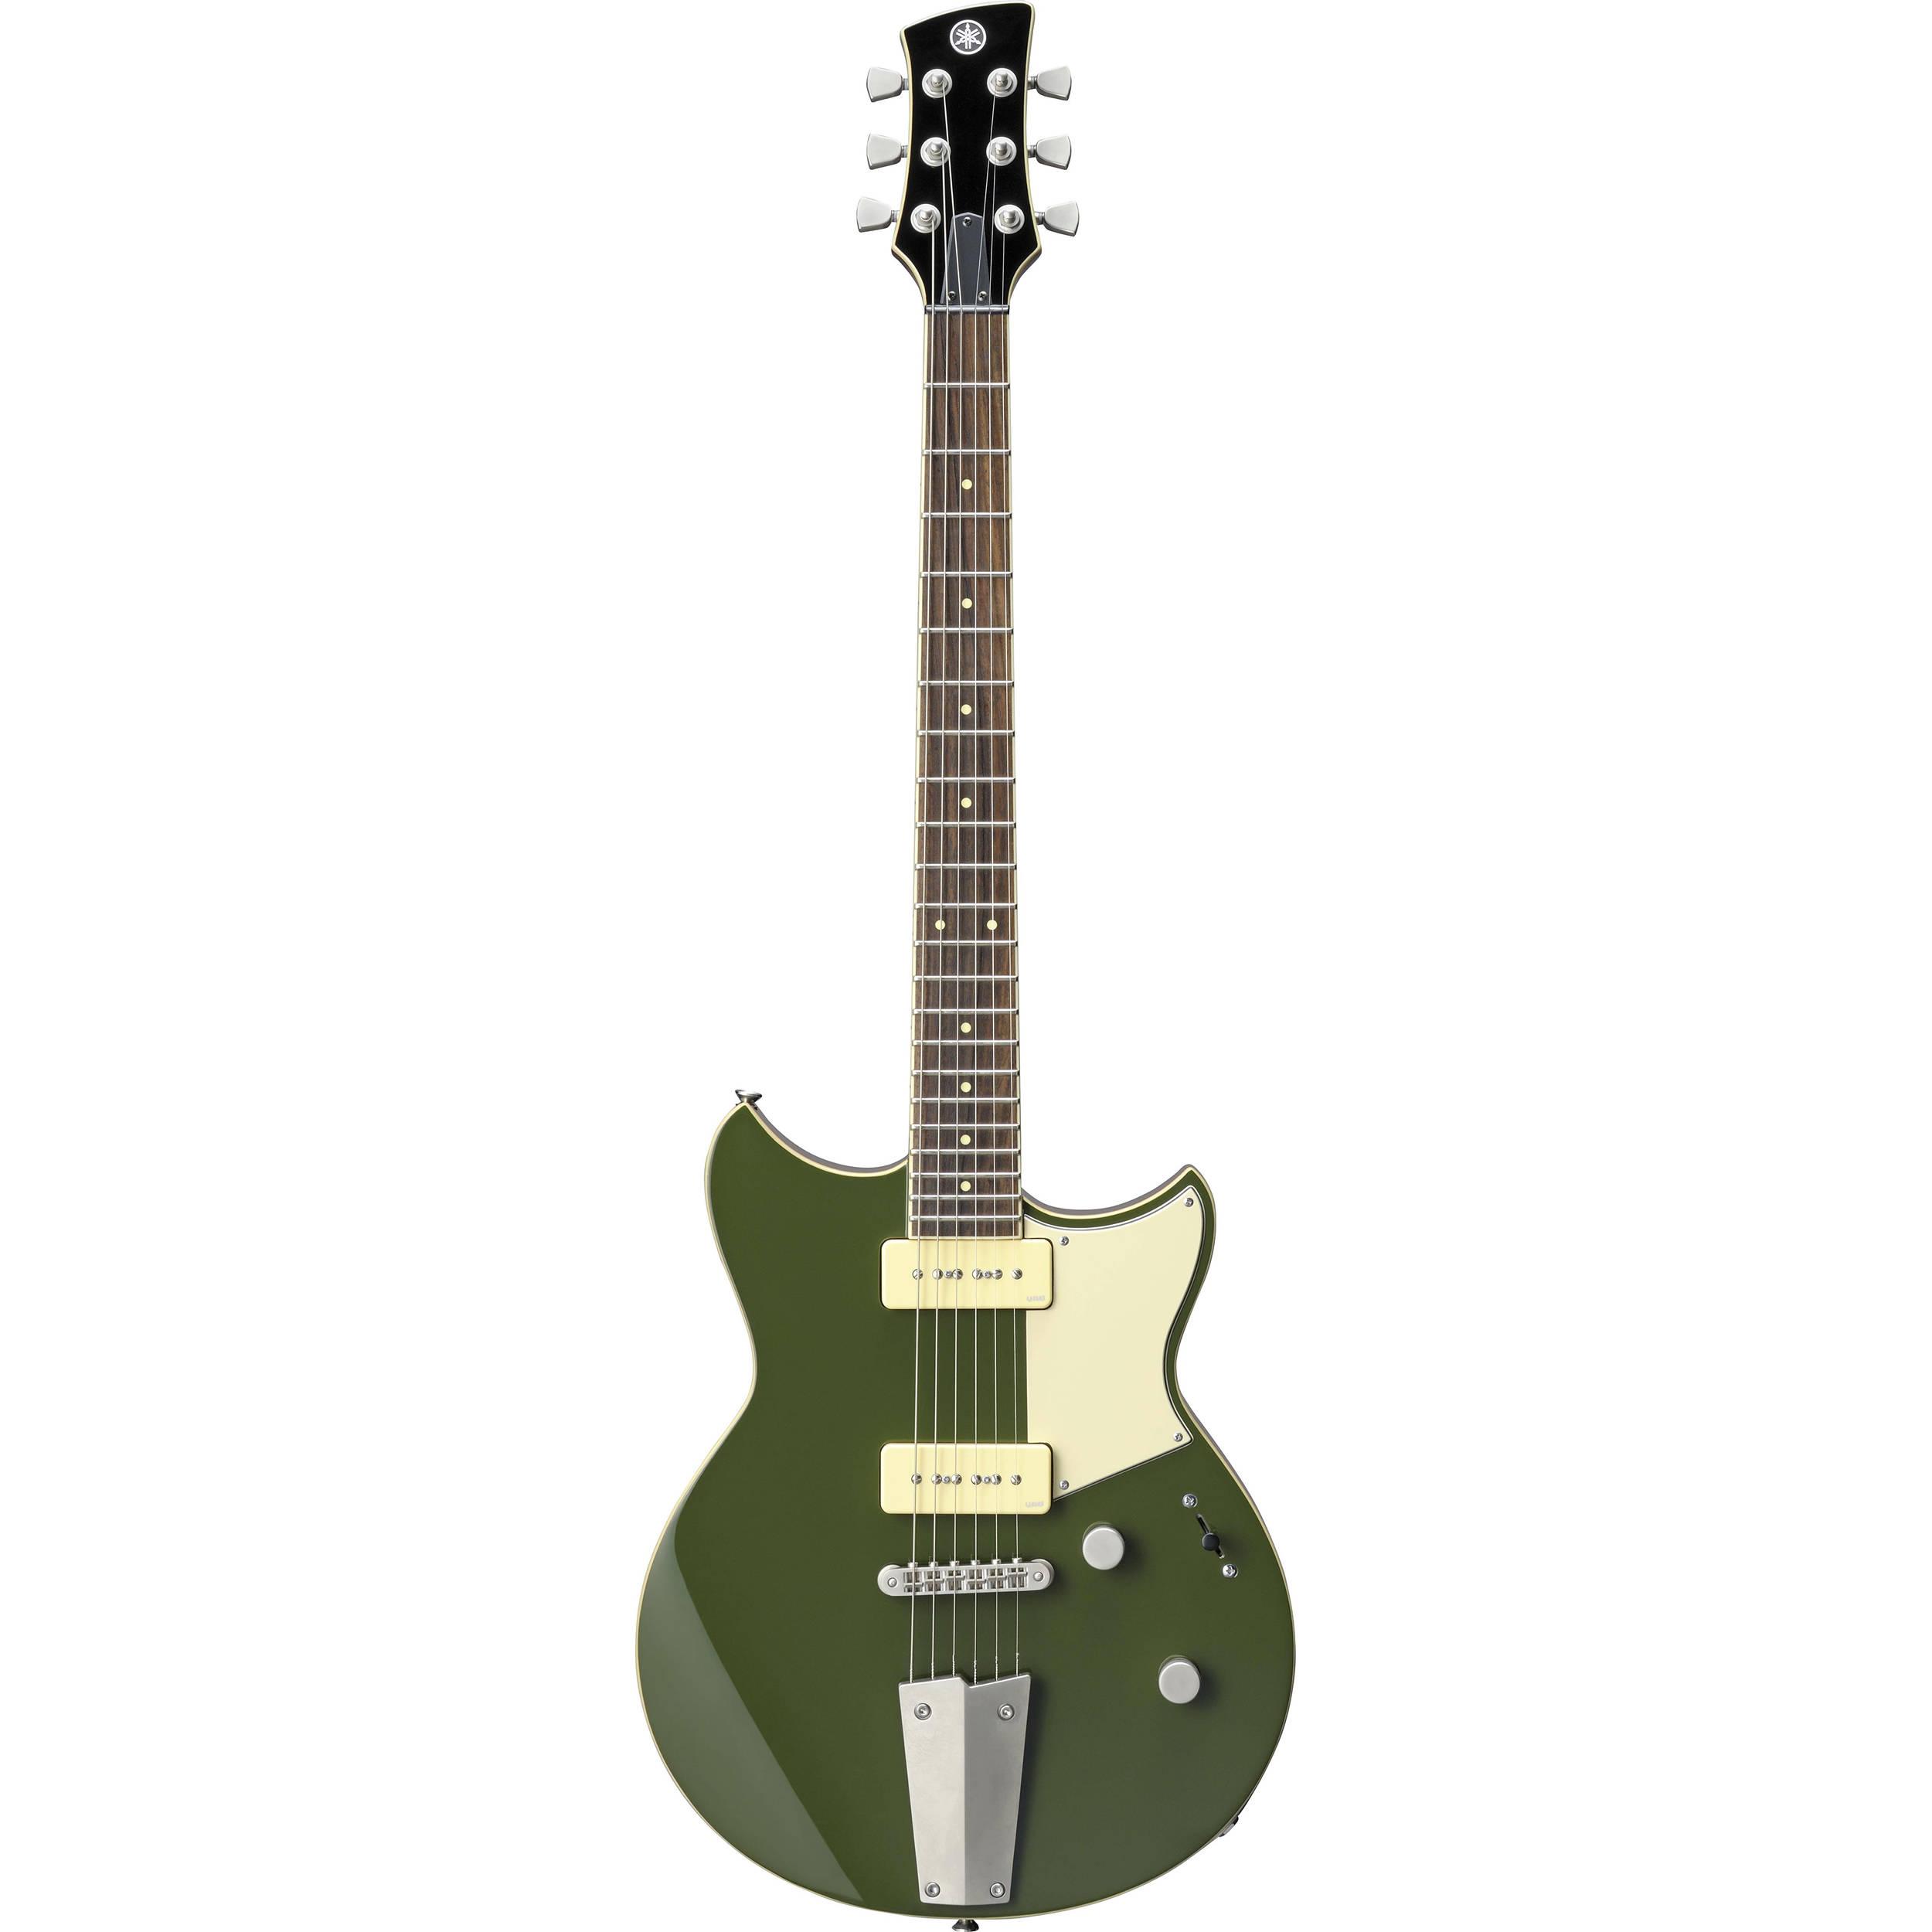 yamaha revstar rs502t electric guitar bowden green rs502t bgr. Black Bedroom Furniture Sets. Home Design Ideas